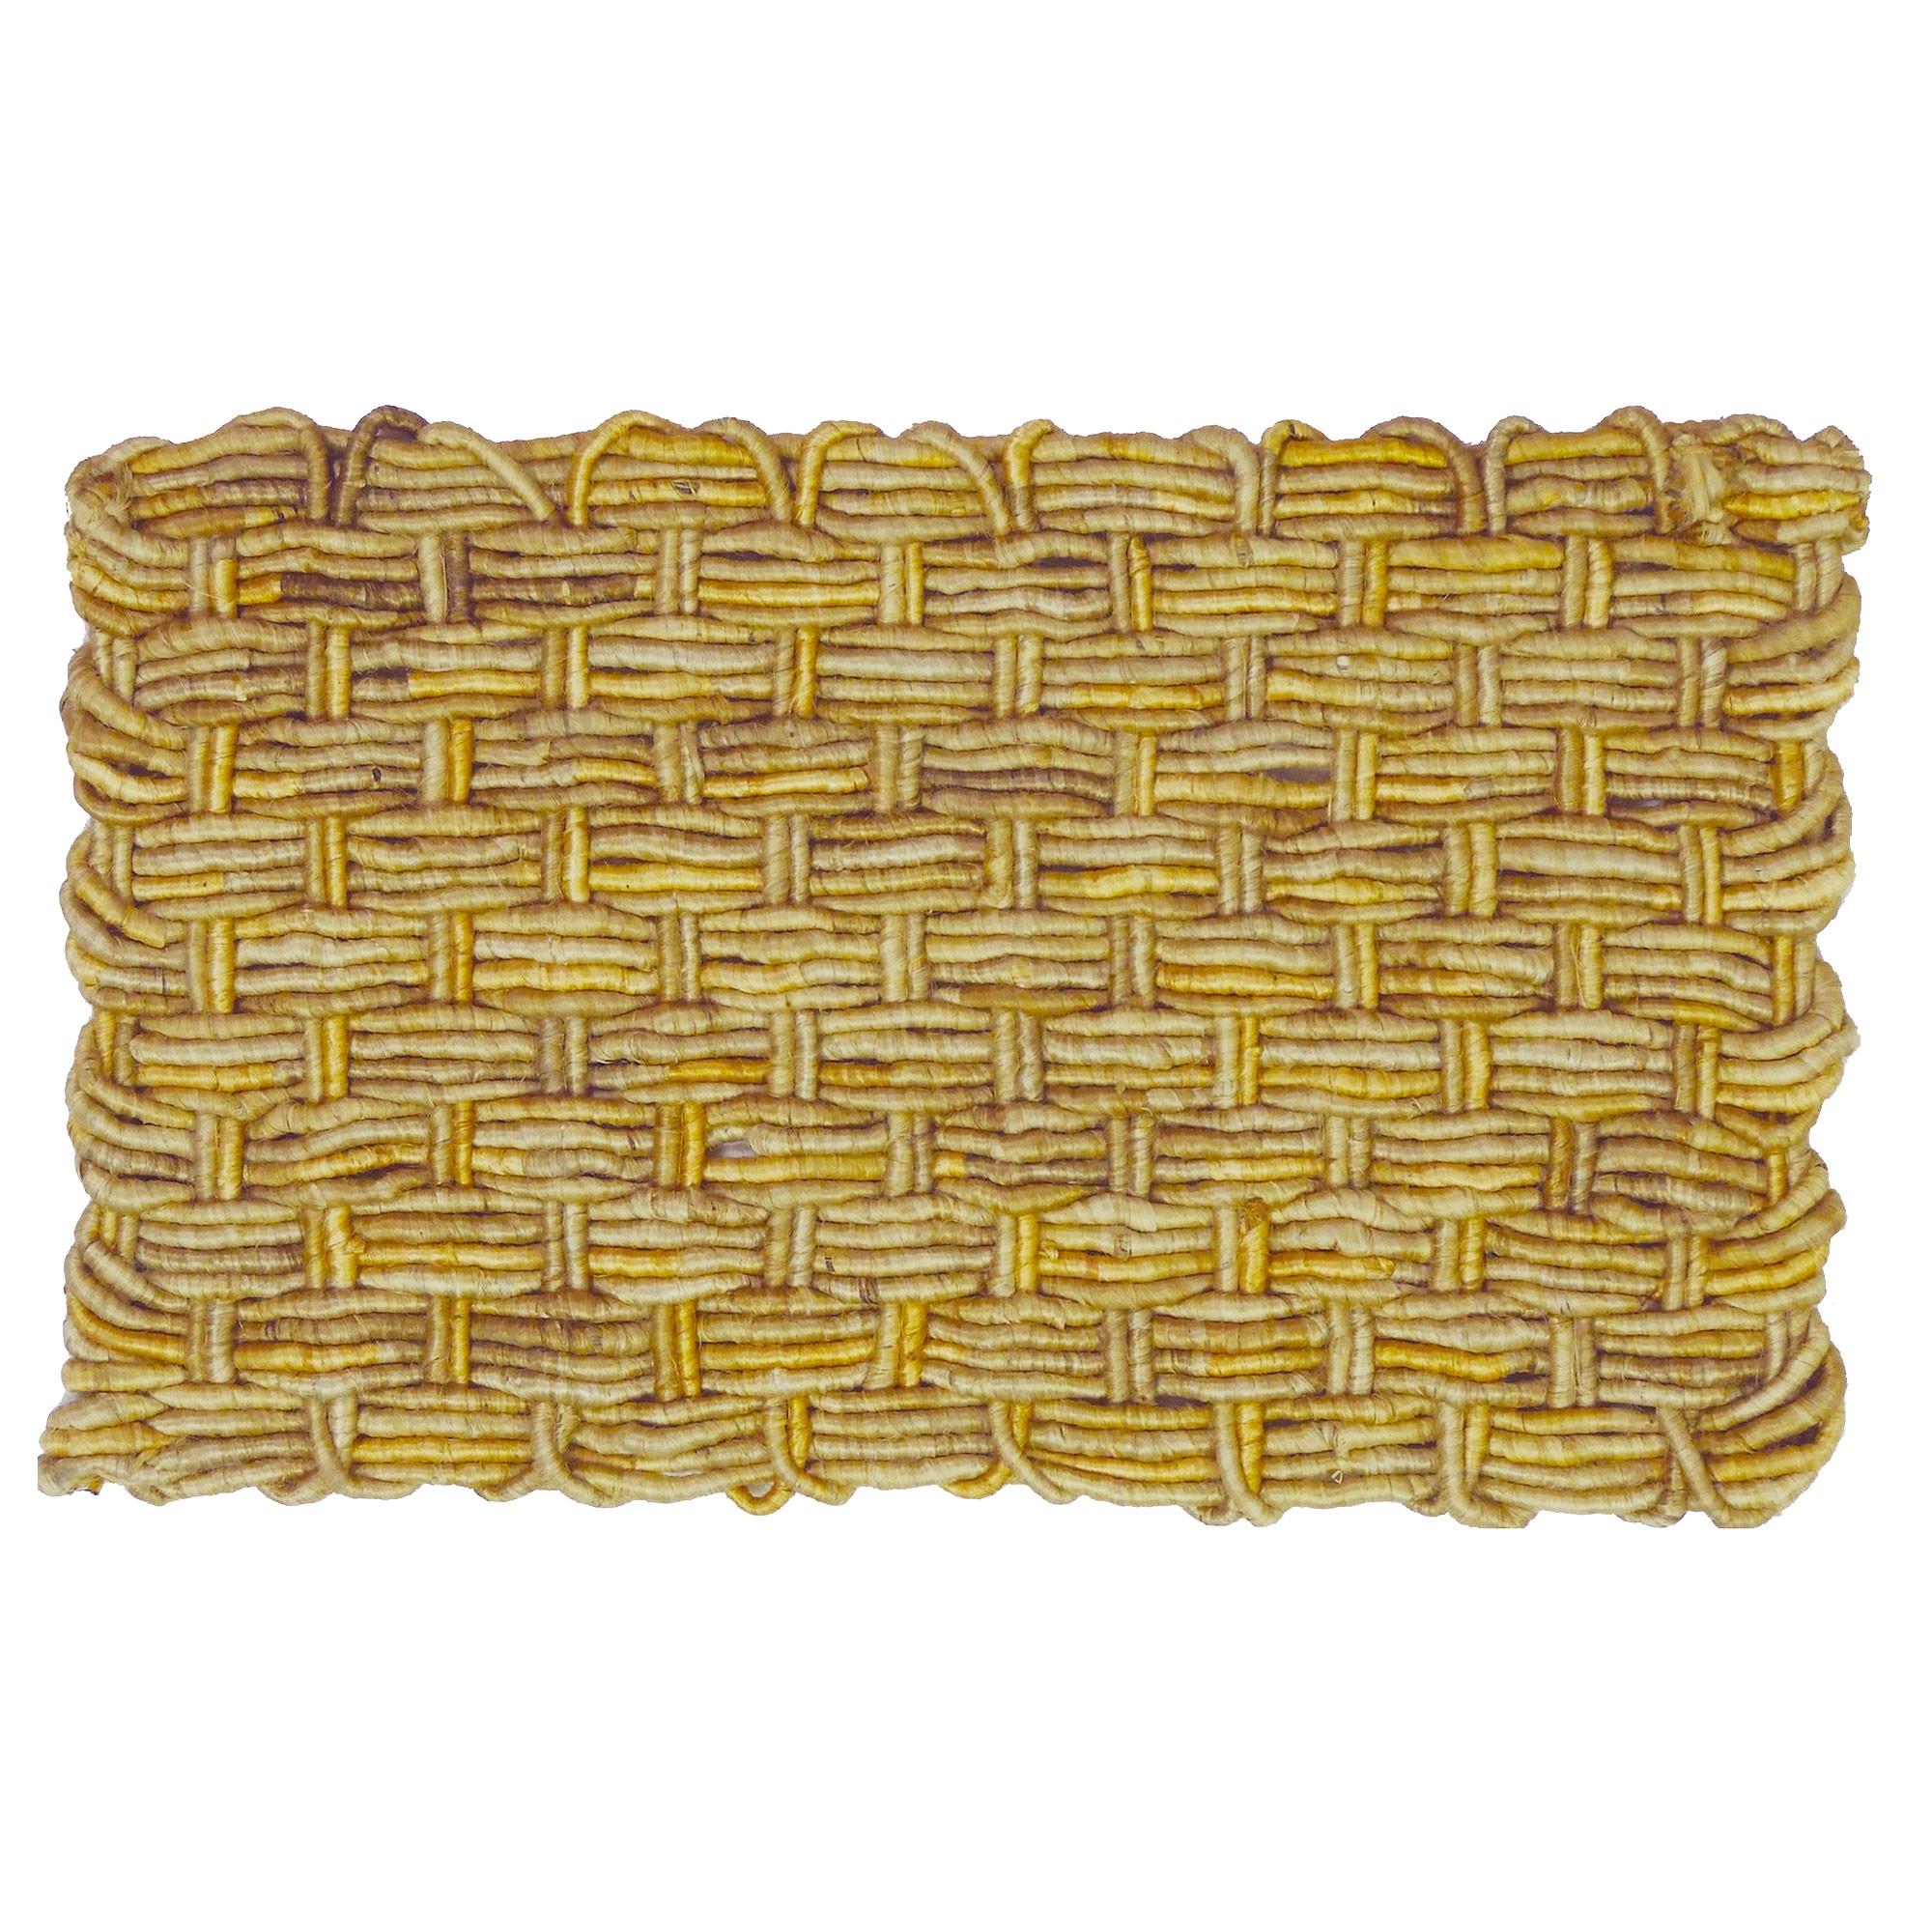 Jumbo Corridor Coiled Yarn Jute Doormat, 80x50cm